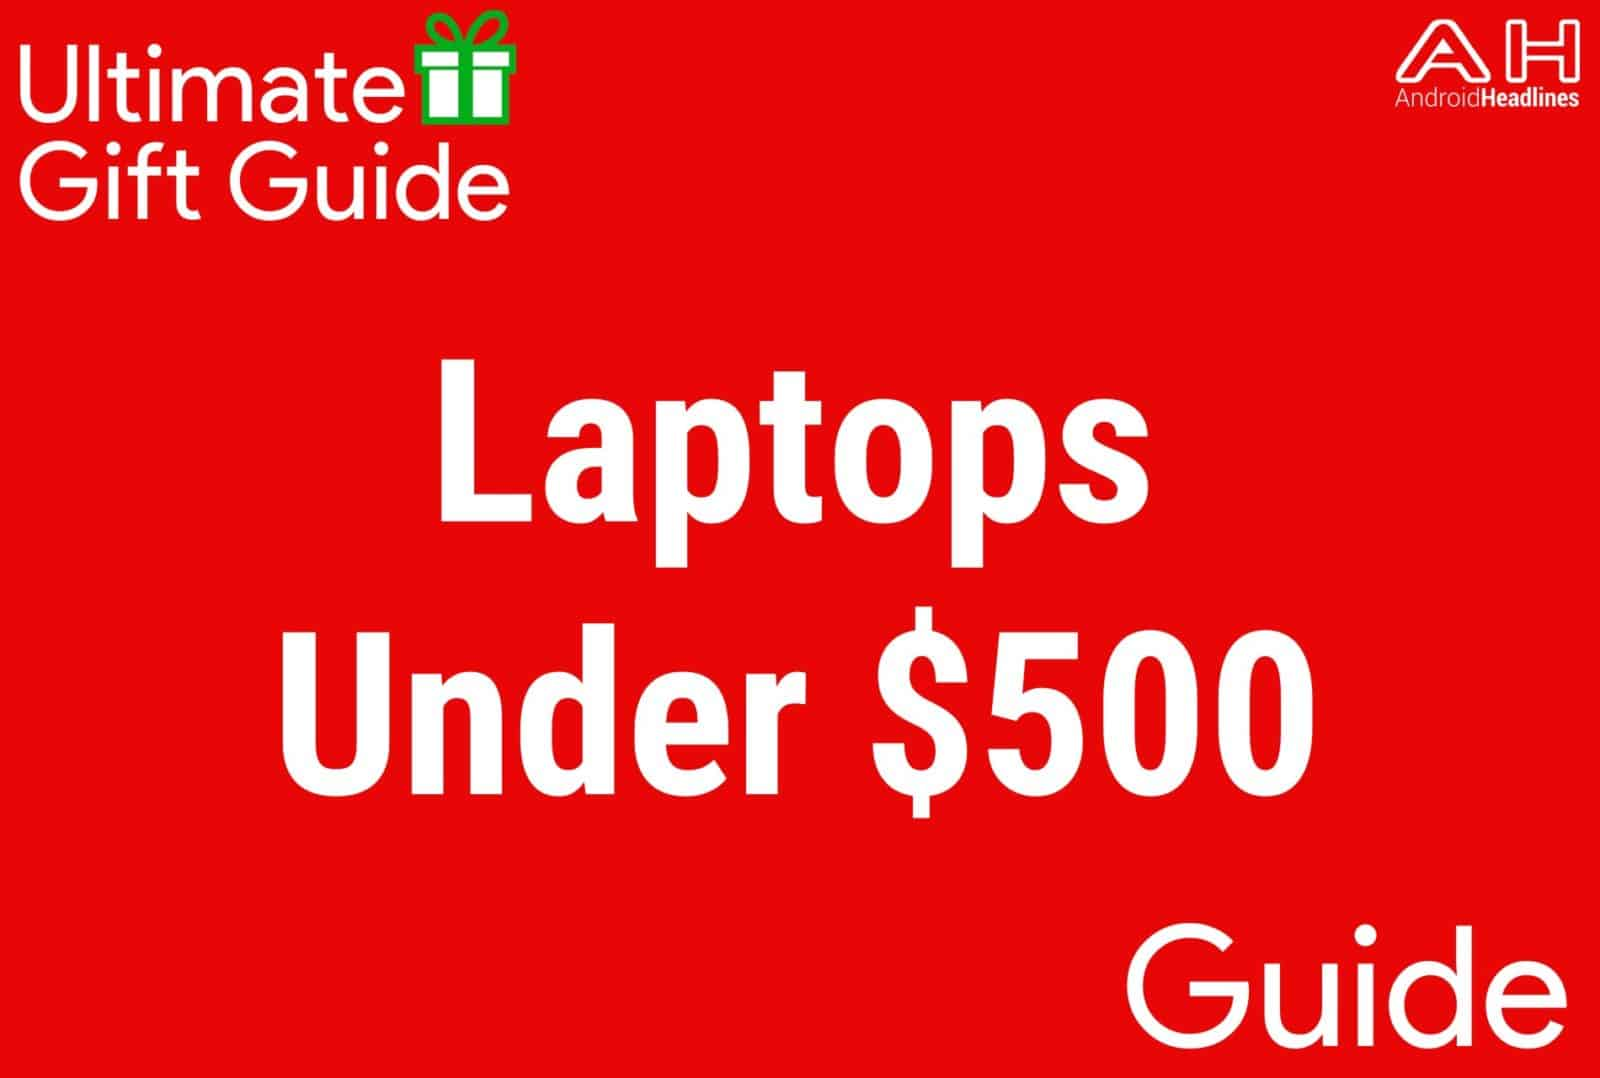 Laptops Under $500 - Gift Guide 2015